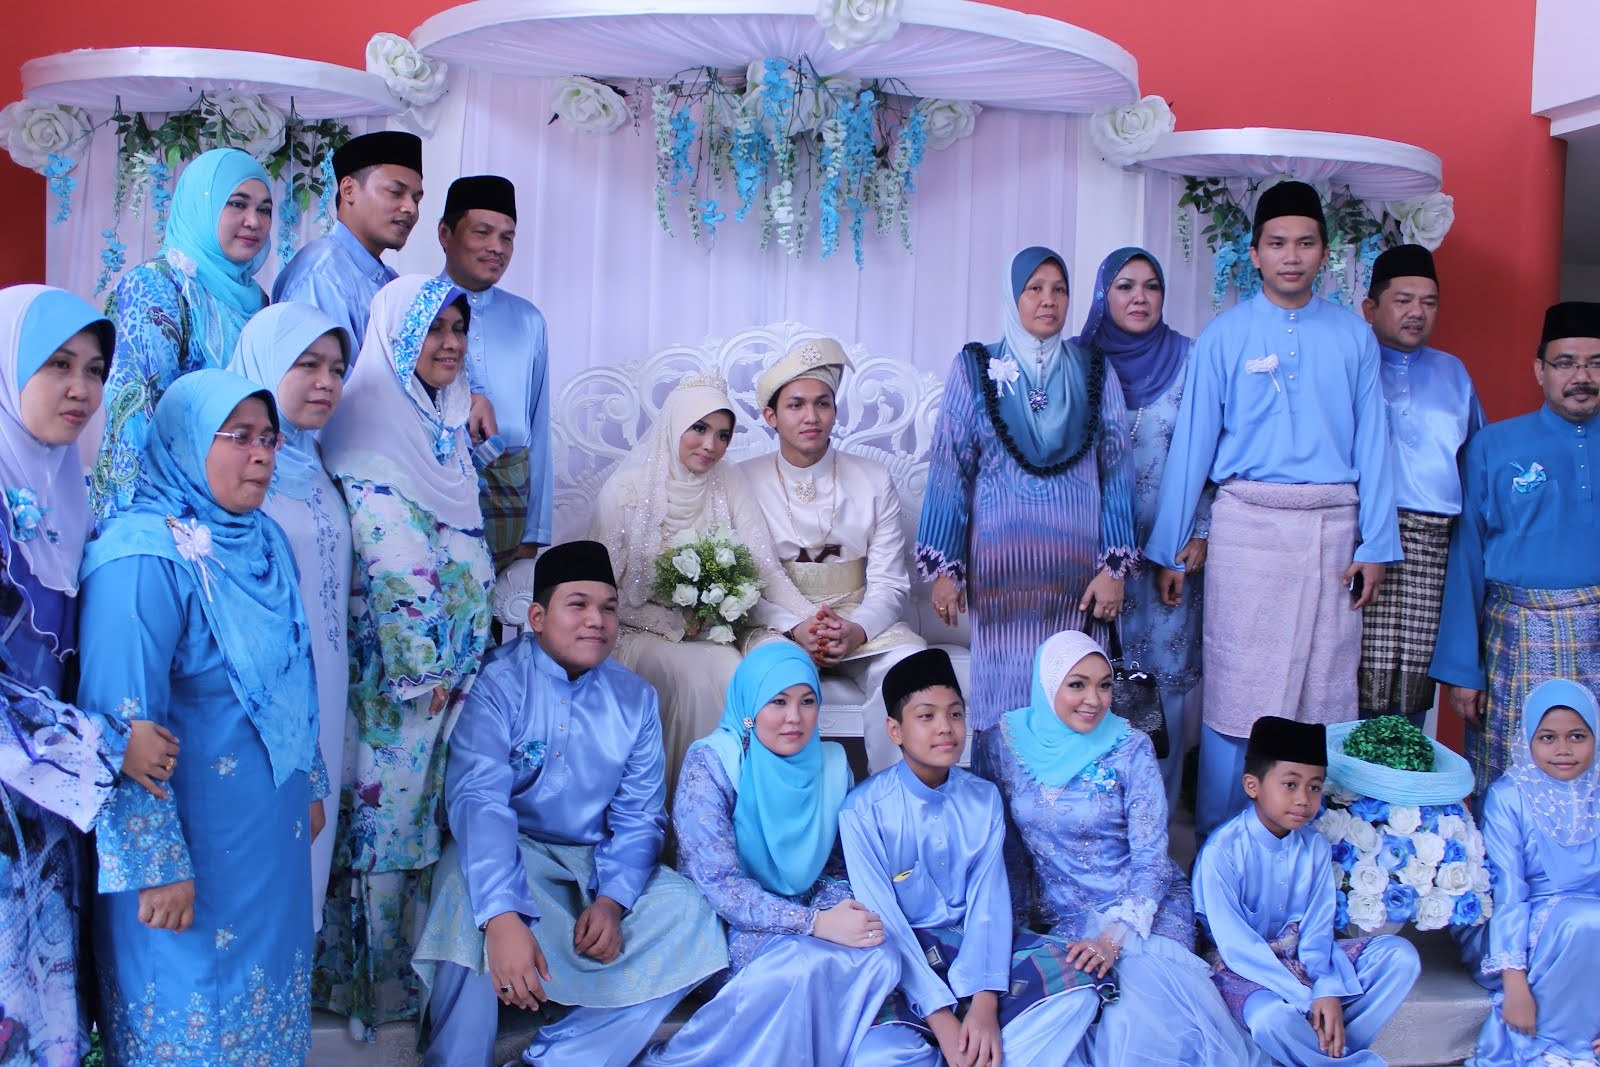 Inspirasi Baju Lebaran Keluarga 2017 S1du 25 Model Baju Lebaran Keluarga Warna Biru Terbaru 2018